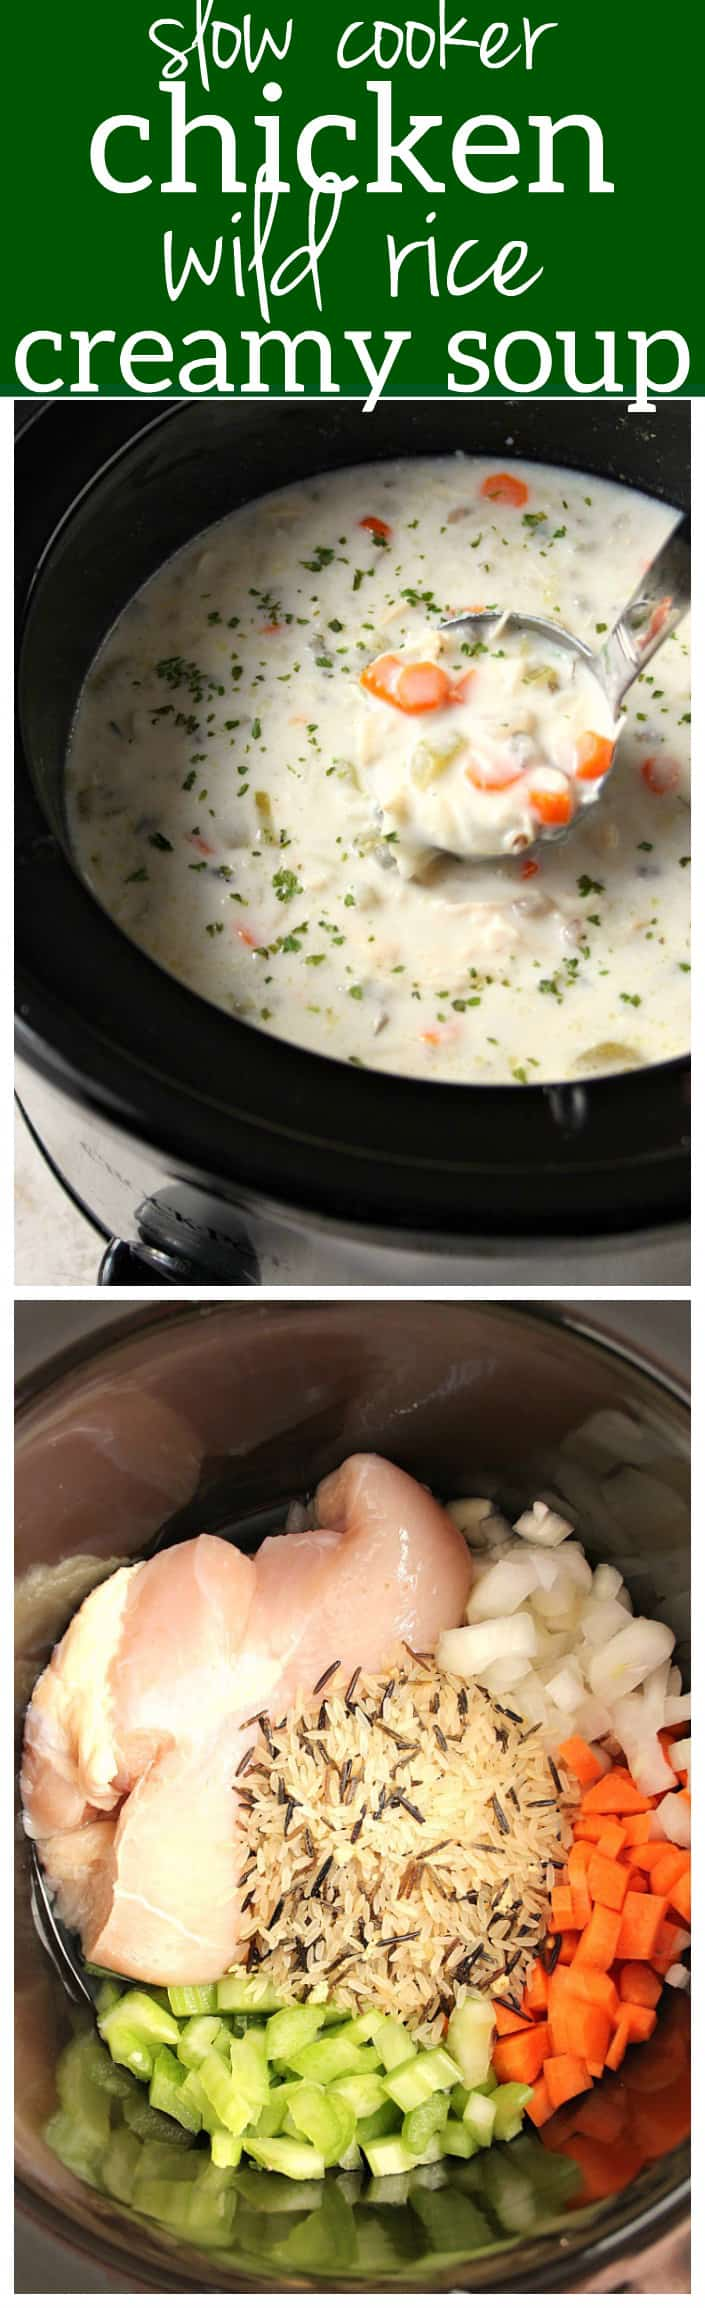 1chicken wild rice crock pot soup long Slow Cooker Chicken Wild Rice Soup Recipe